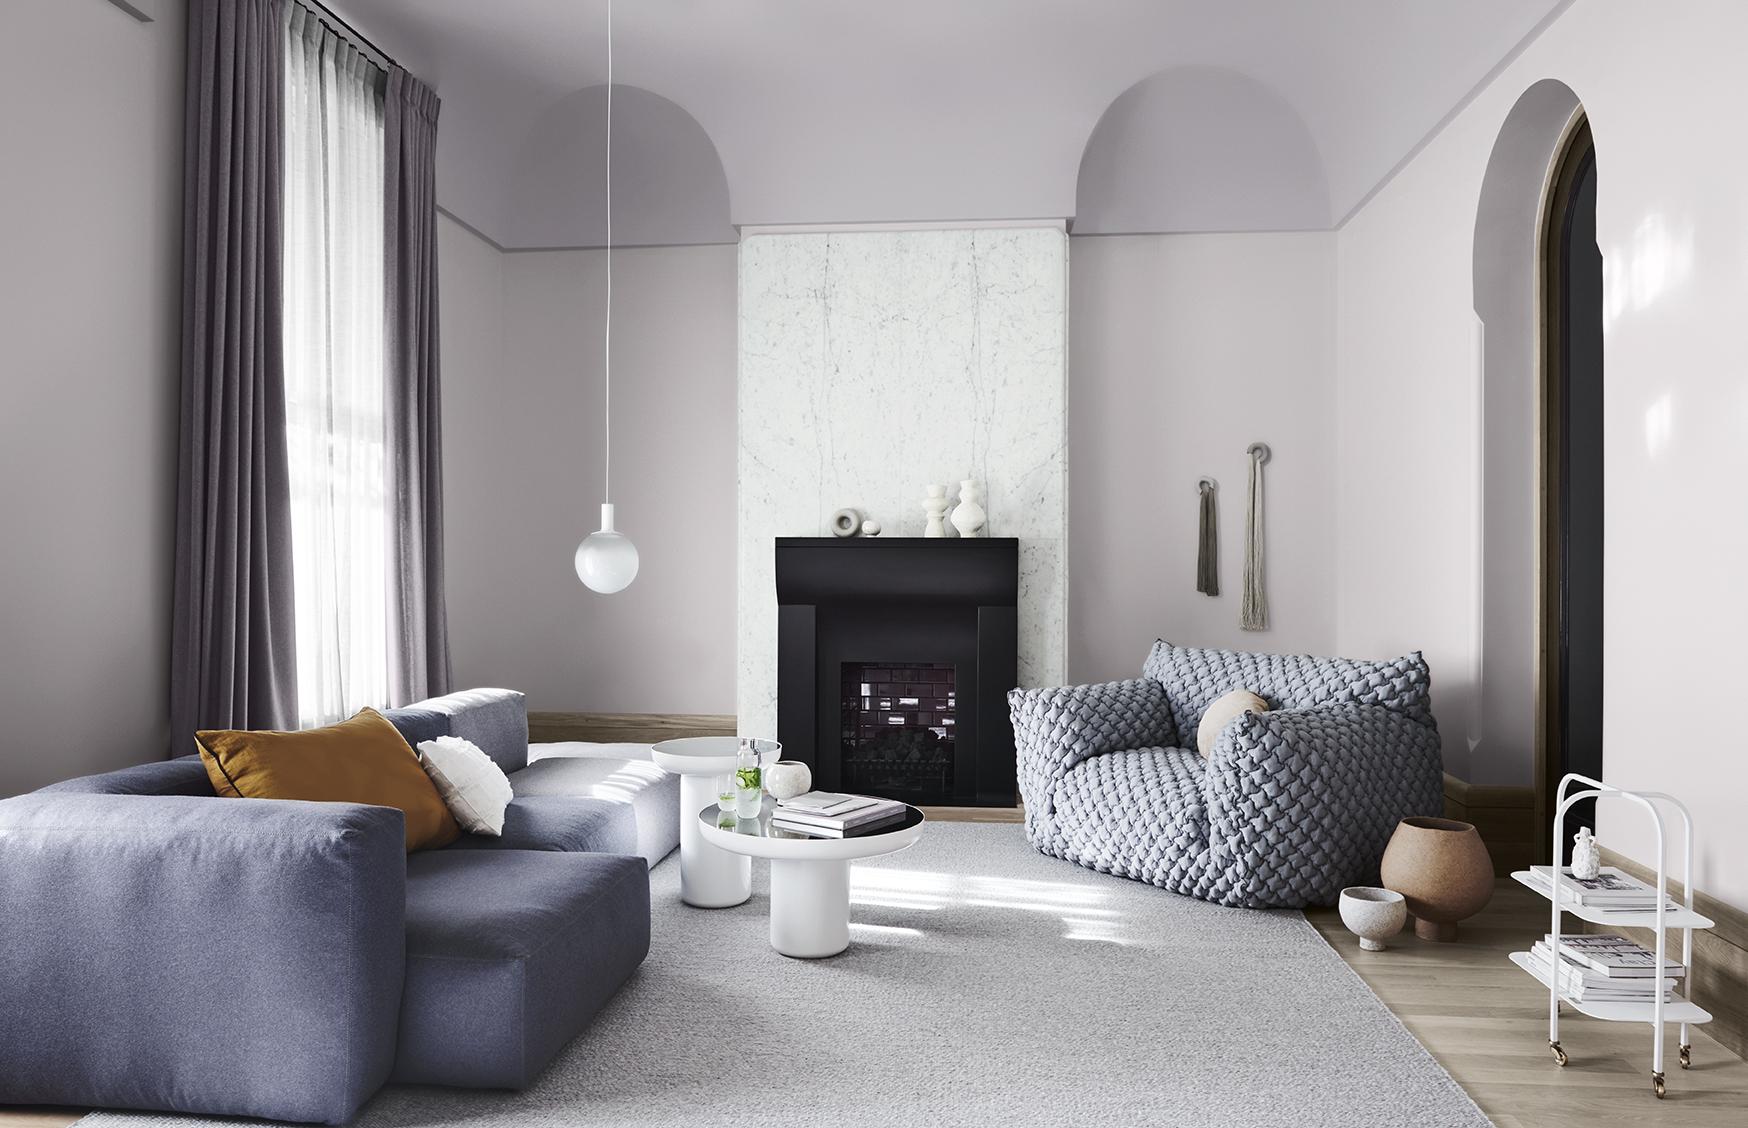 Wholeself Palette Dulux Colour Forecast. Stylist Bree Leech. Photographer Lisa Cohen. Wall colour Dulux Silver Thaw, ceiling in Dulux Milton.